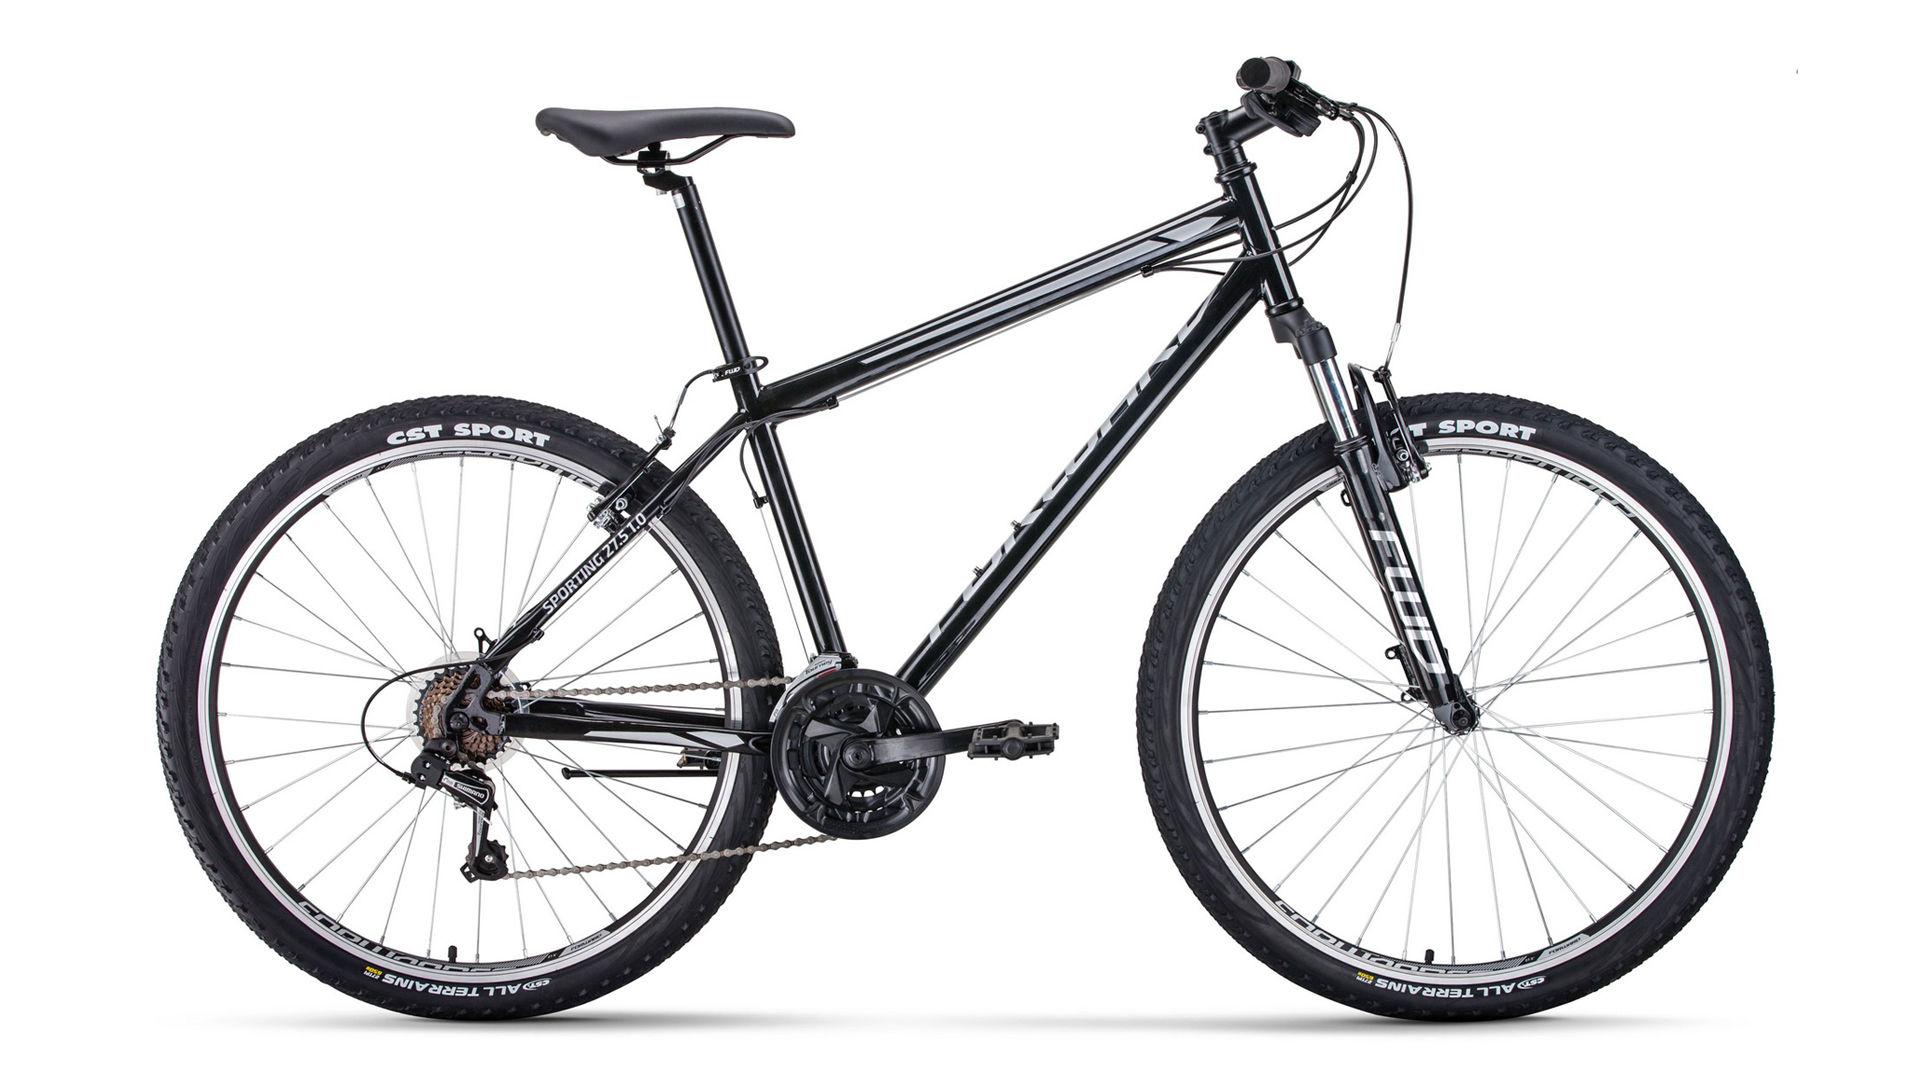 FORWARD Велосипед Forward Sporting 27.5 1.0 (2020) черный/серый 19